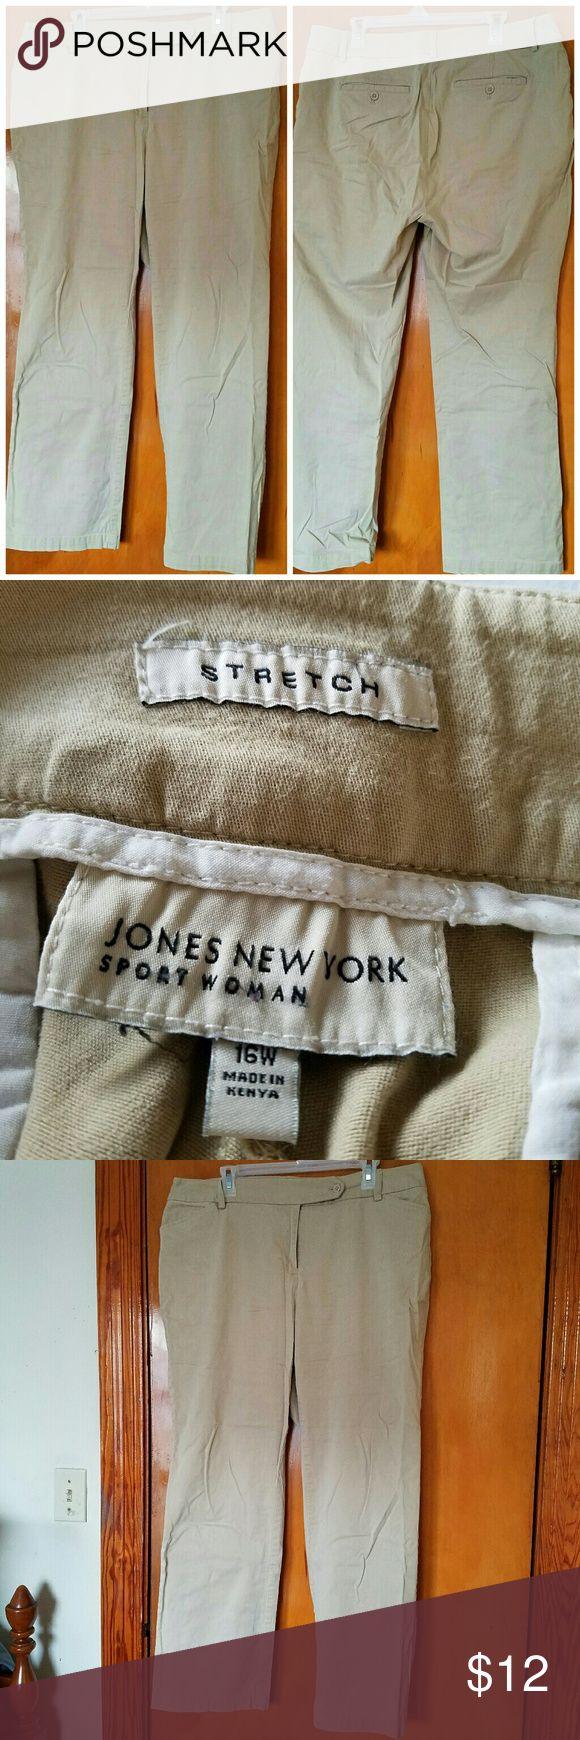 Khaki Slacks Jones New York, Khaki Slacks, Gently loved condition with no significant or noticeable flaws. Jones New York Pants Straight Leg